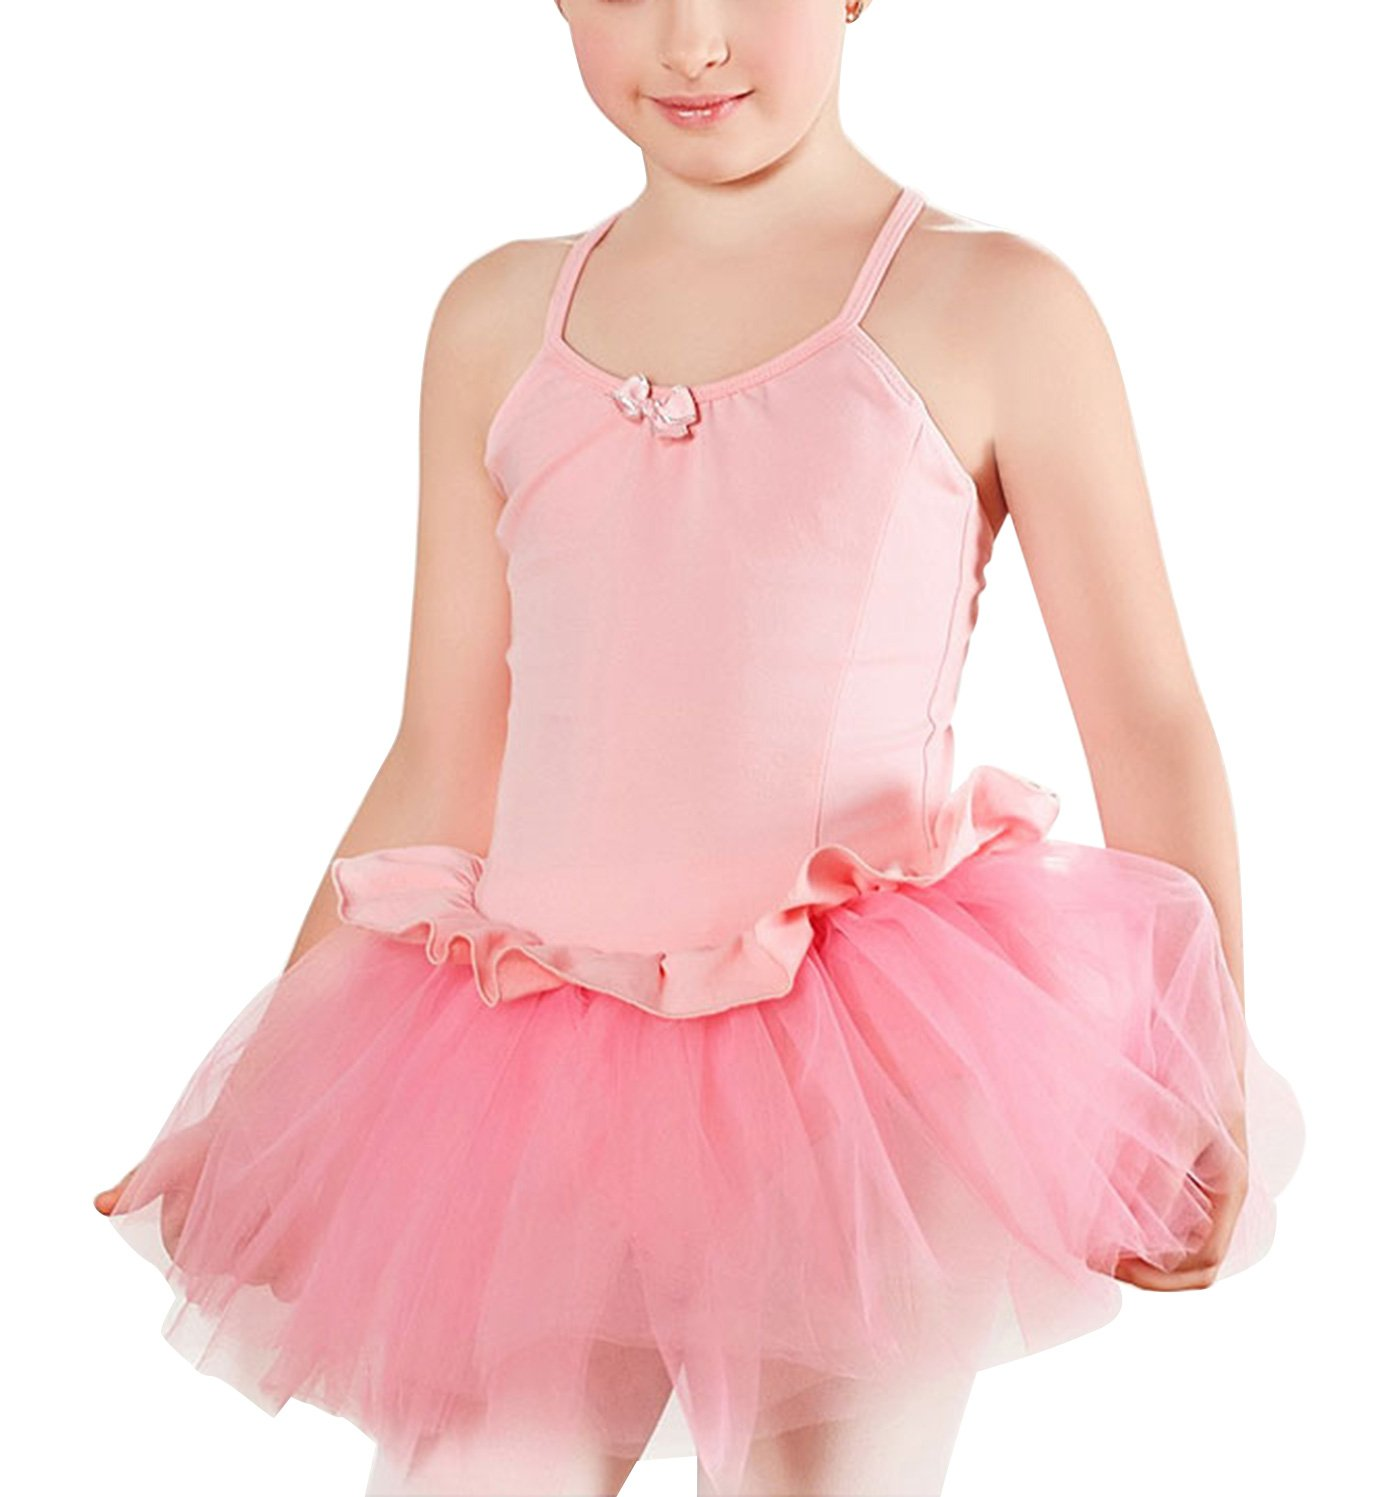 FEOYA Girls Ballet Leotard Camisole Dancing Outfit Cotton Tank Tutu Skirt